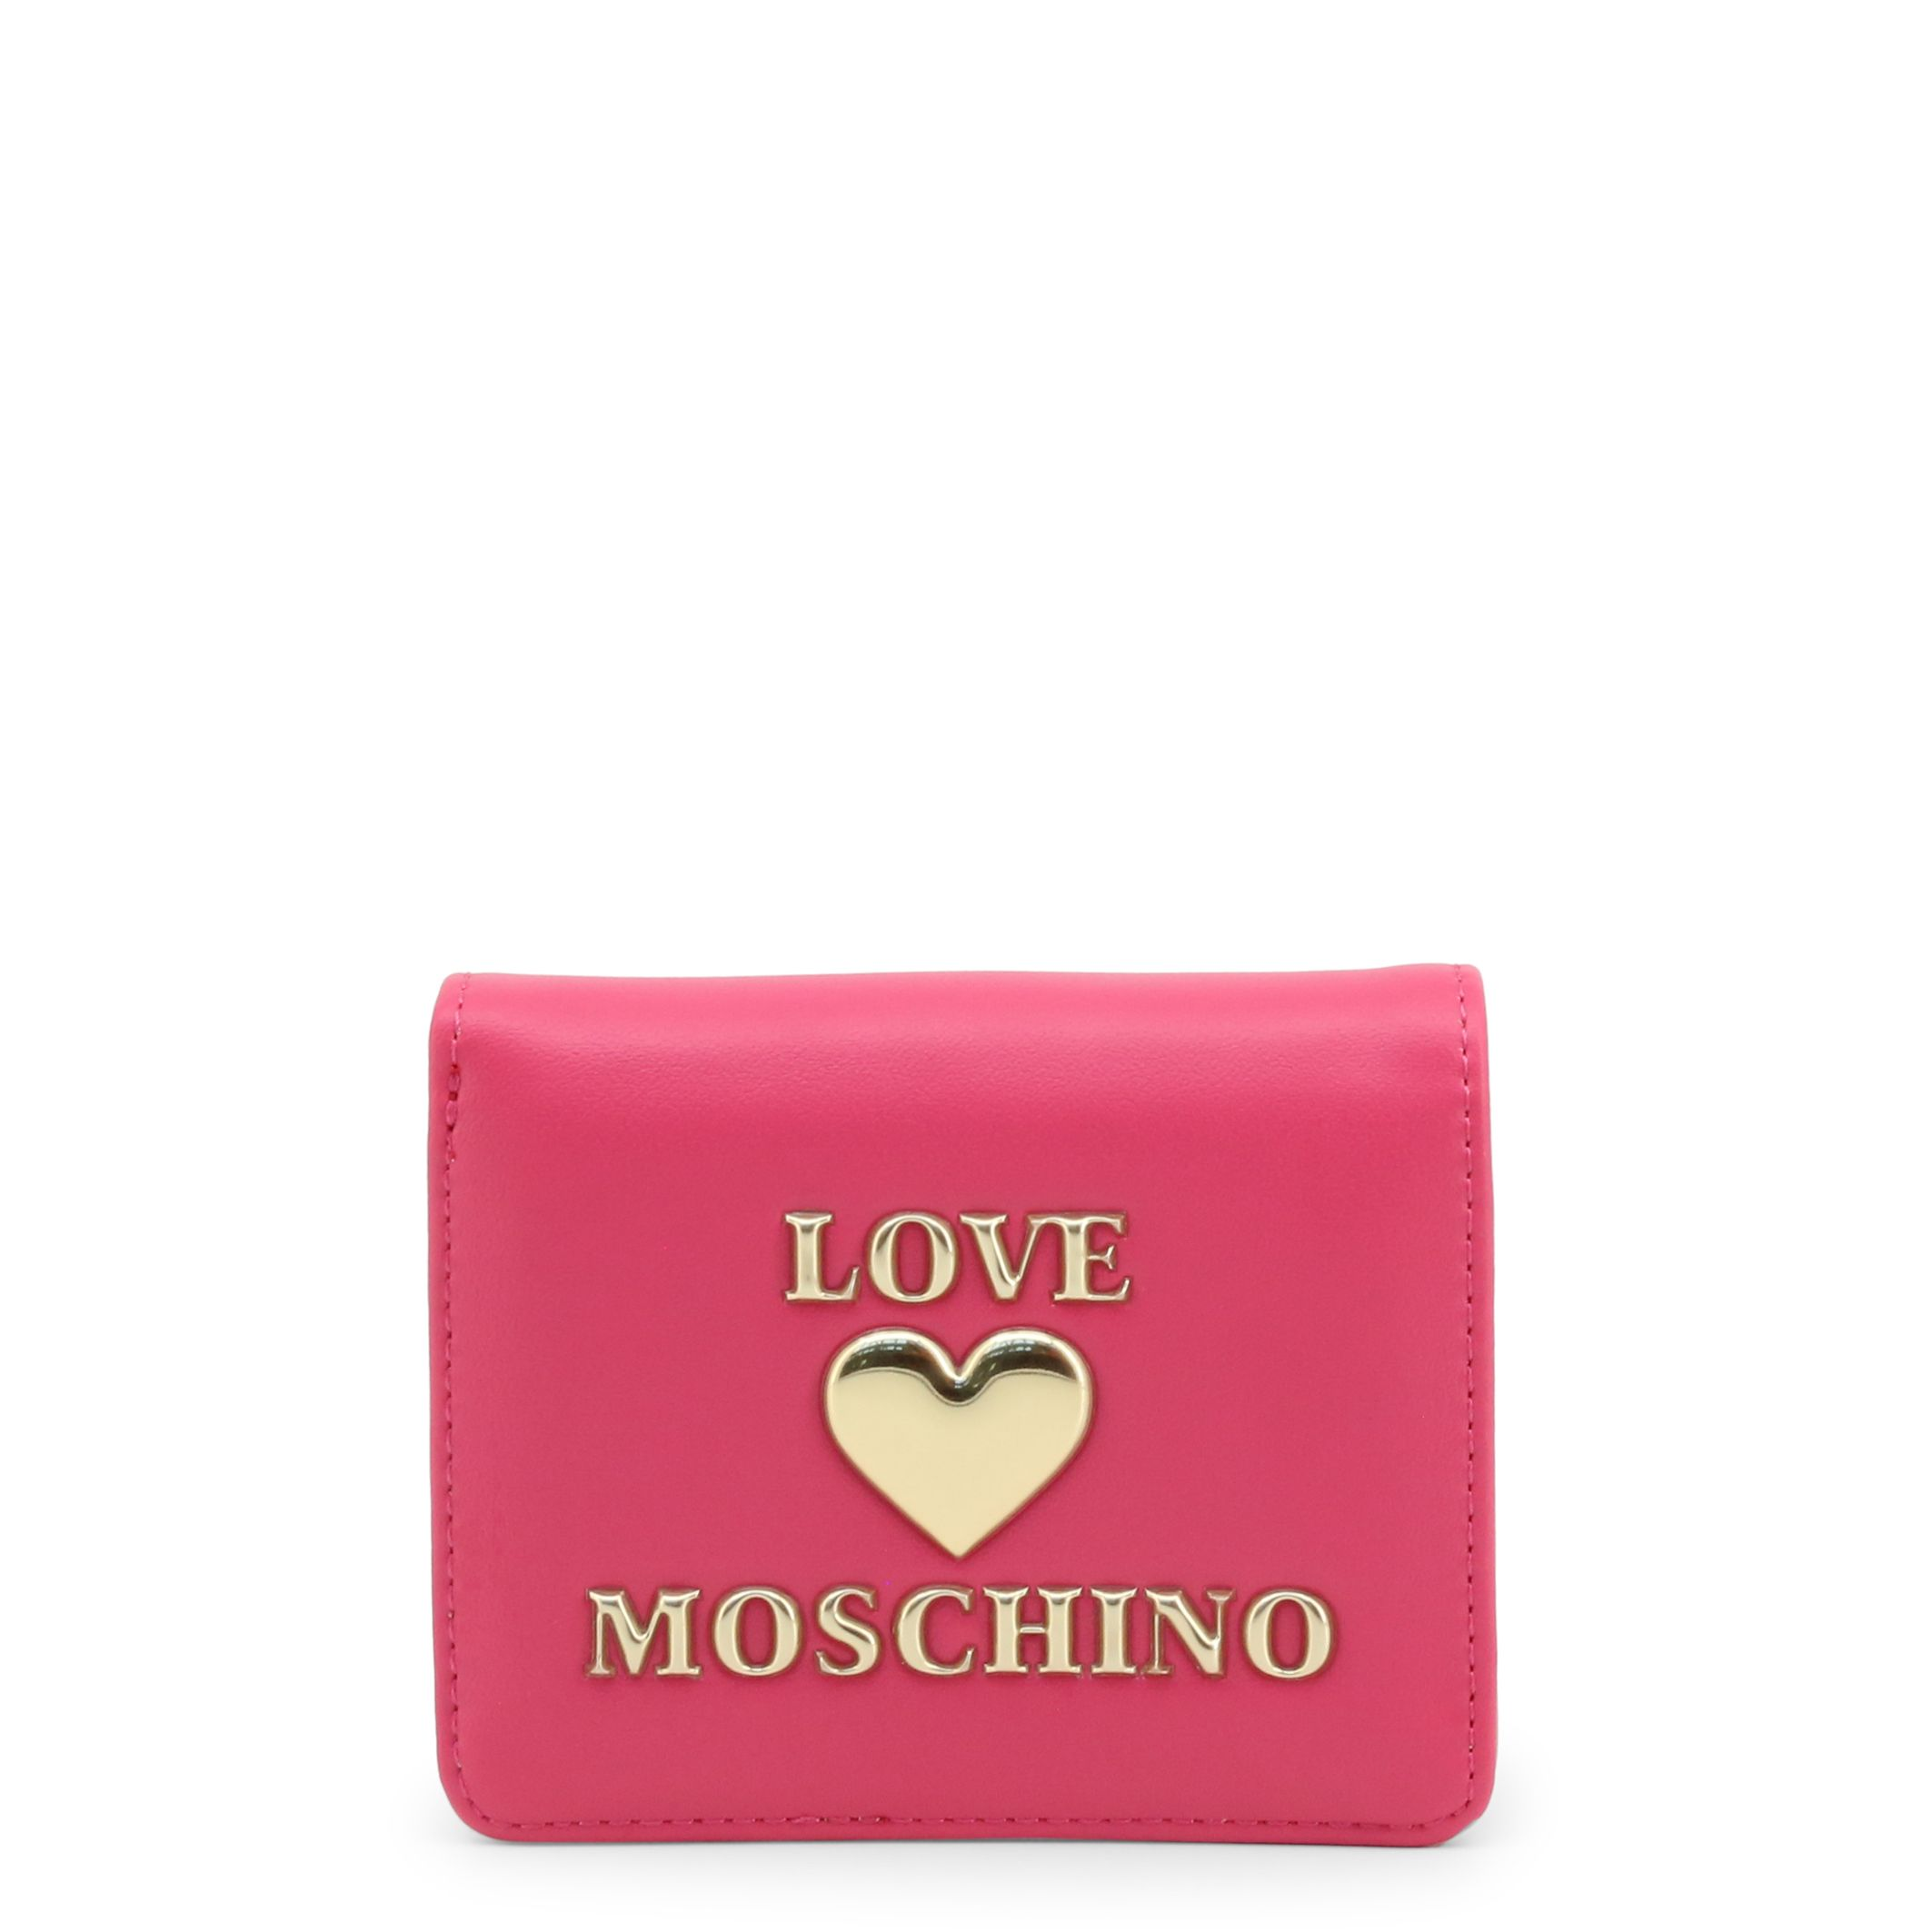 Love Moschino – JC5625PP1CLF0 – Roze Designeritems.nl